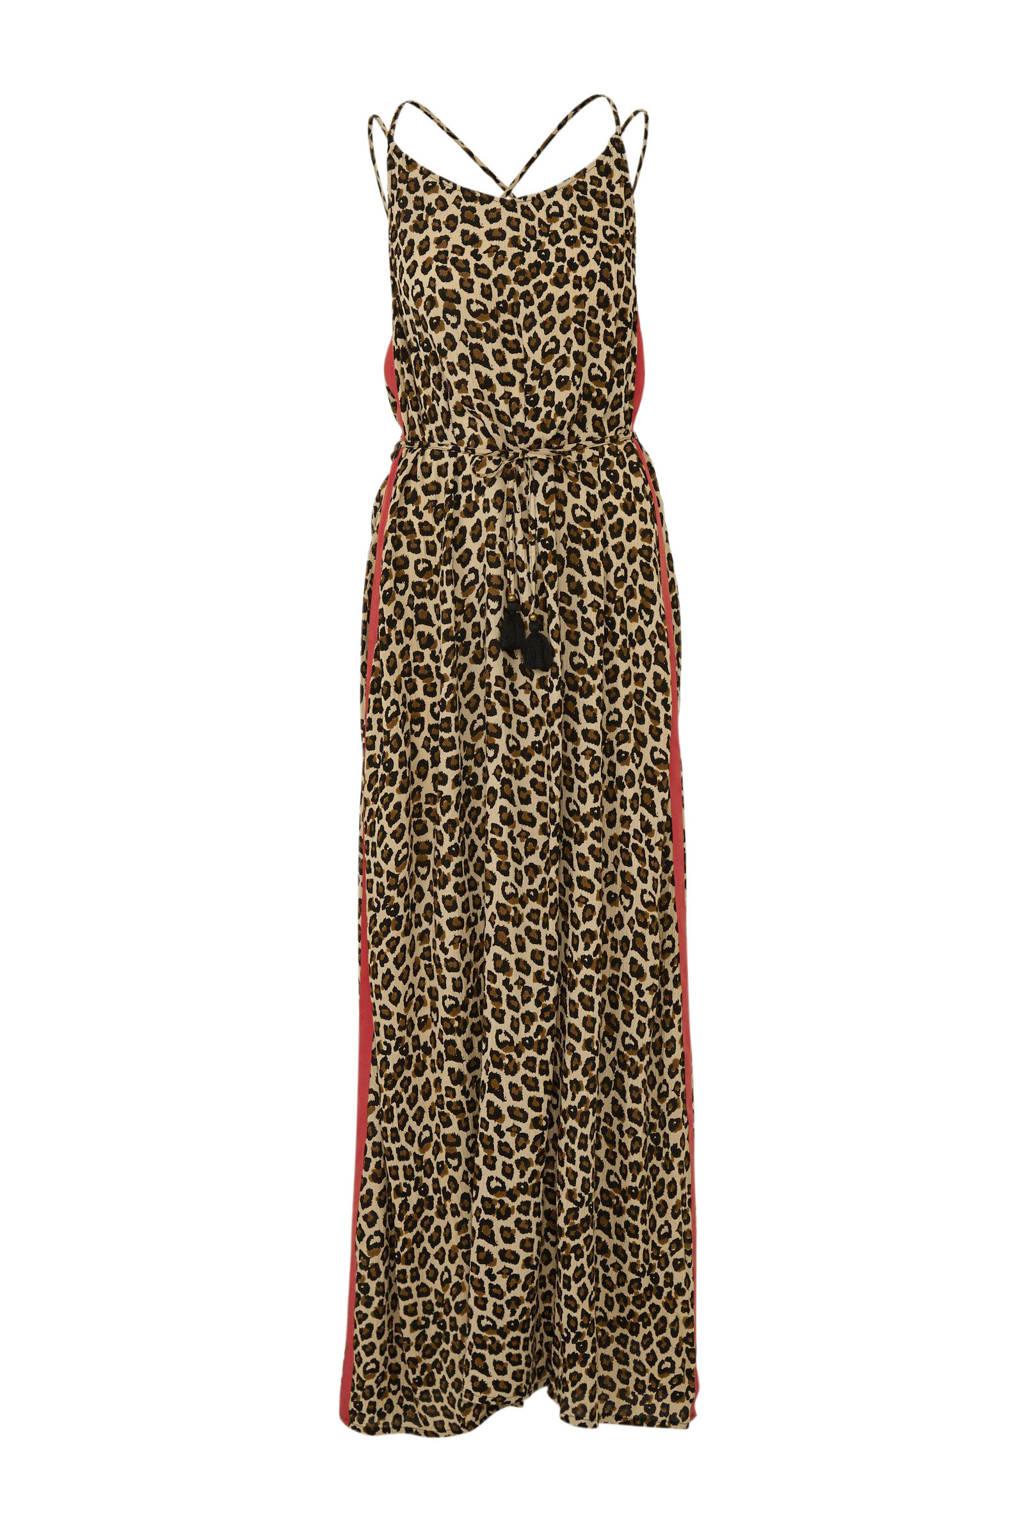 whkmp's beachwave maxi jurk met panterprint en contrastbies bruin/zwart/rood, Bruin/Zwart/Rood